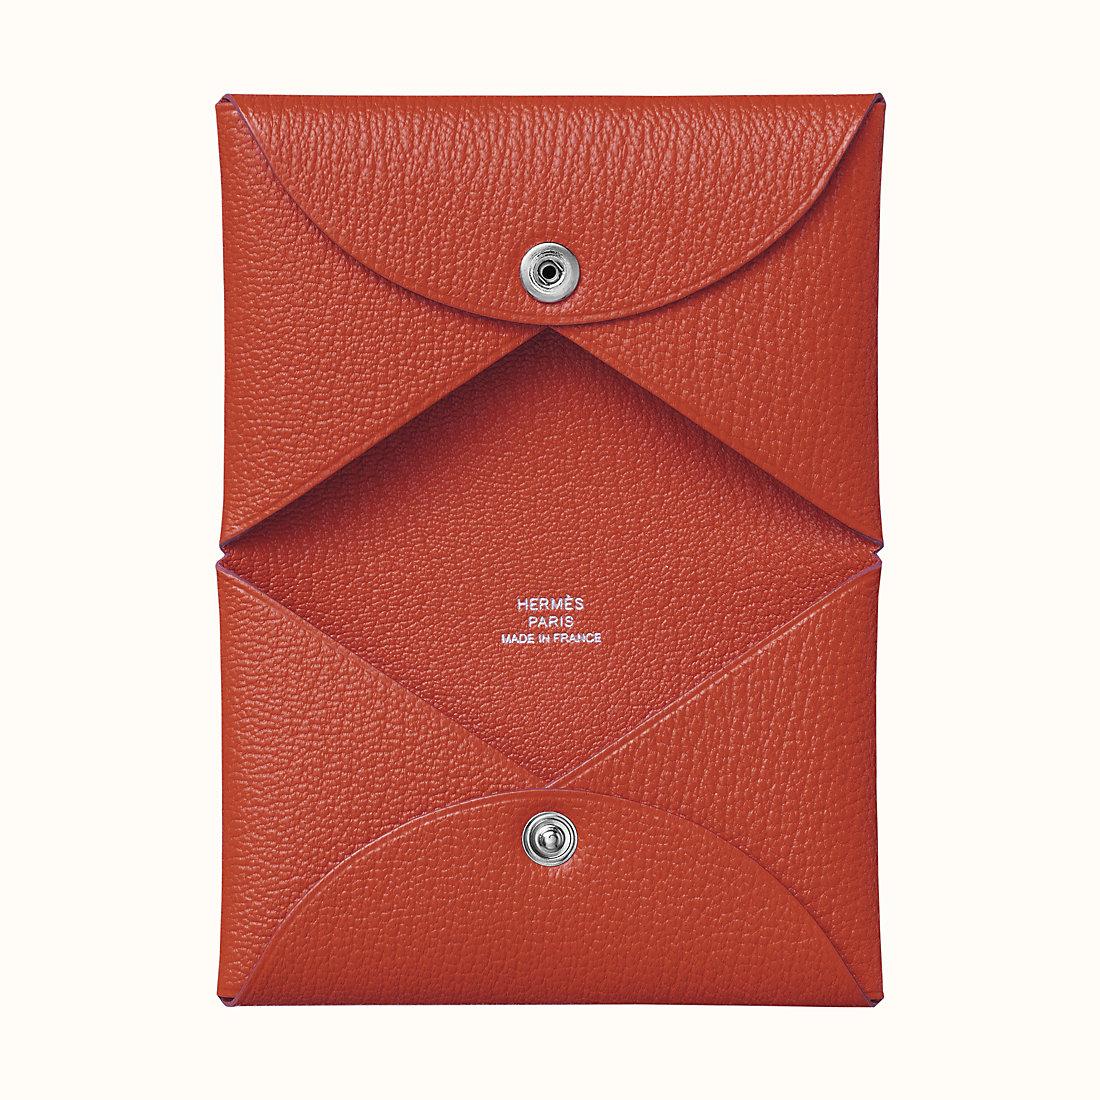 Macao Hermes Calvi verso card holder CK36 砖红色 山羊皮